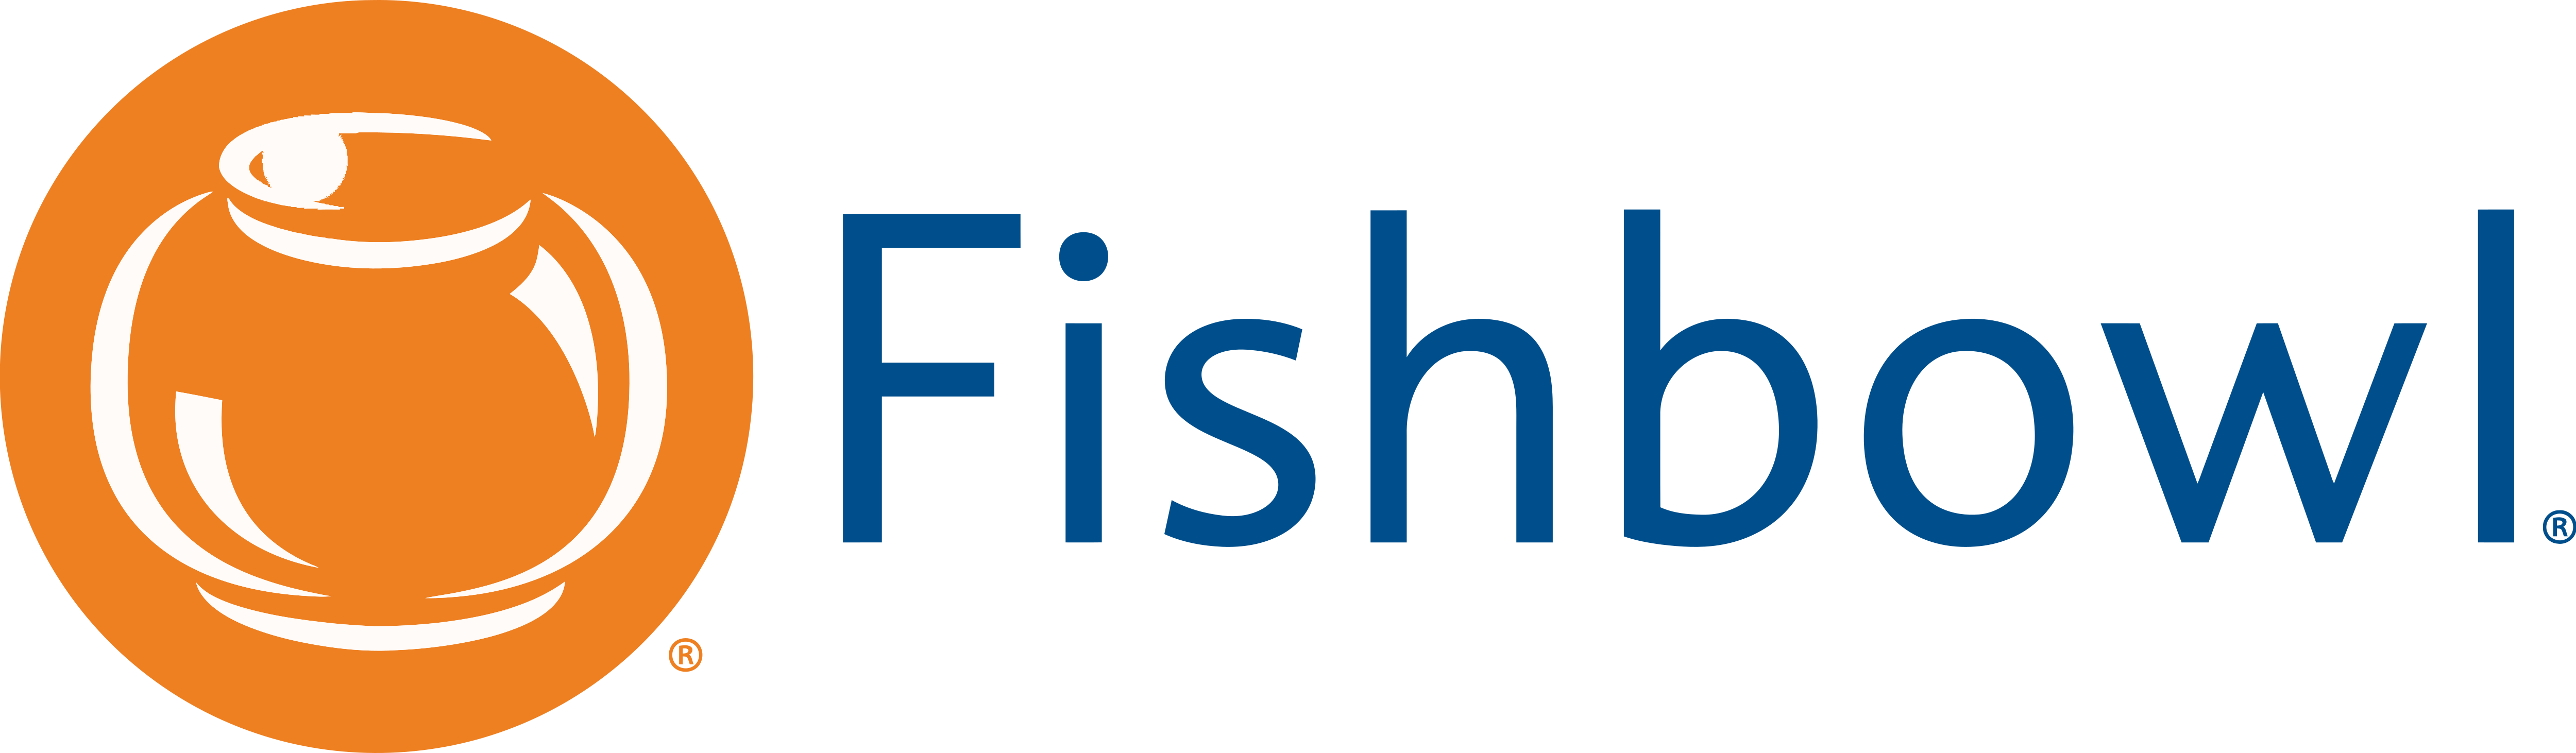 Fishbowl | Logo